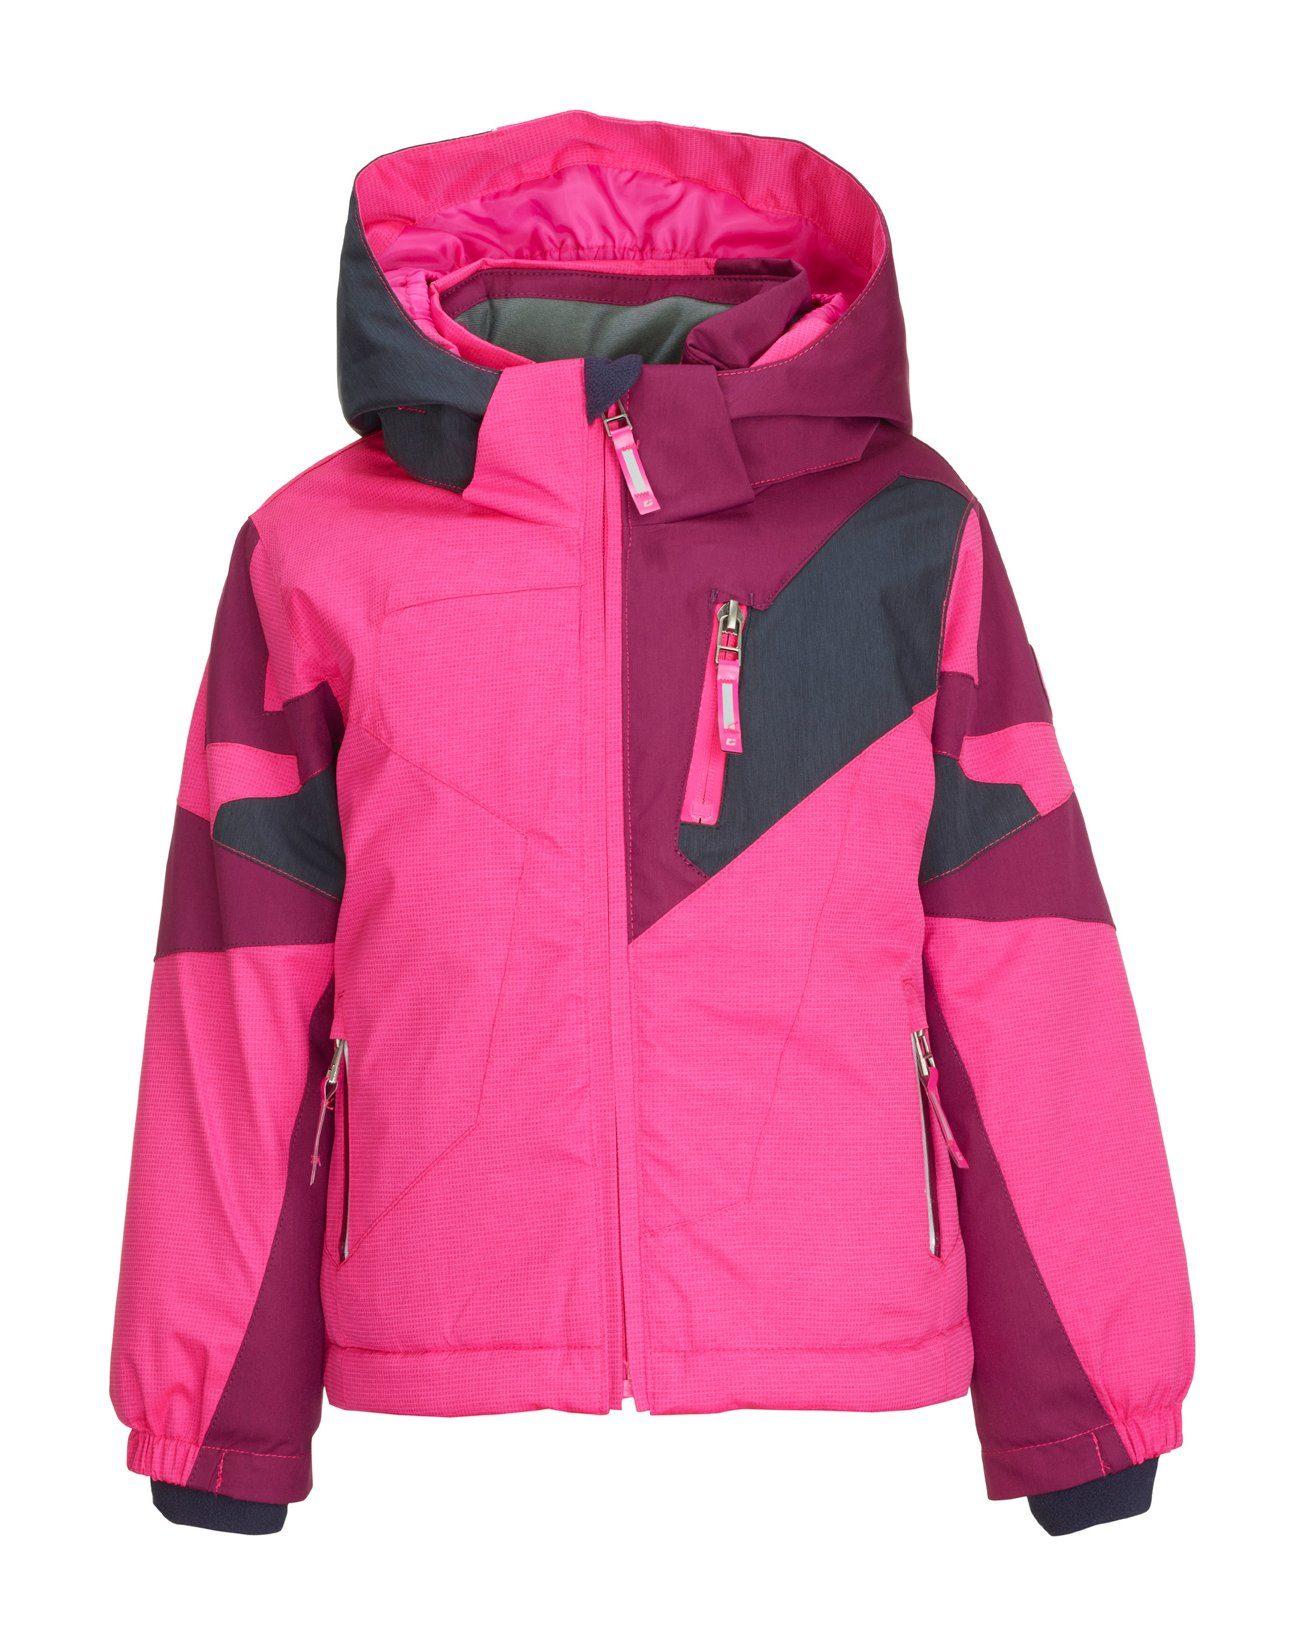 Neu KILLTEC Skijacke Skijacke Skijacke ZABINA für Mädchen